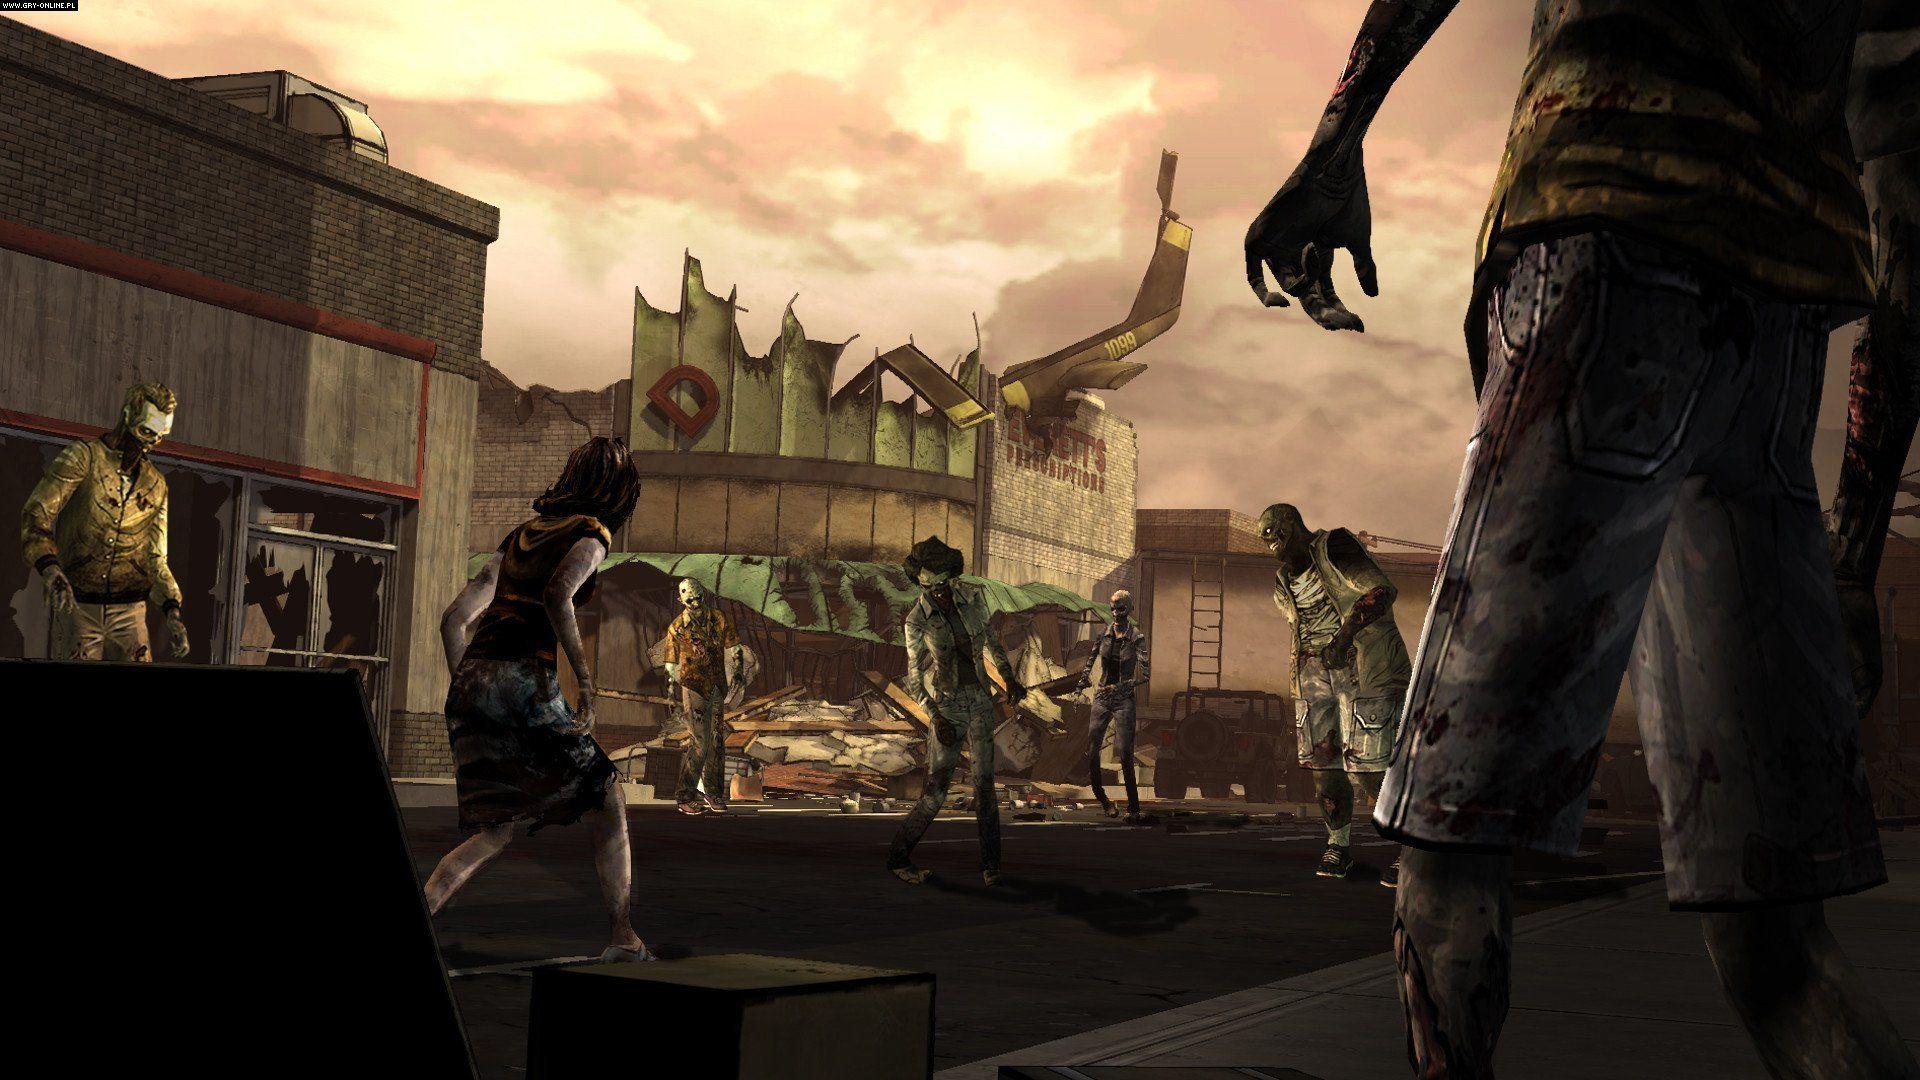 The Walking Dead GAMES | The Walking Dead Game Guide & Walkthrough